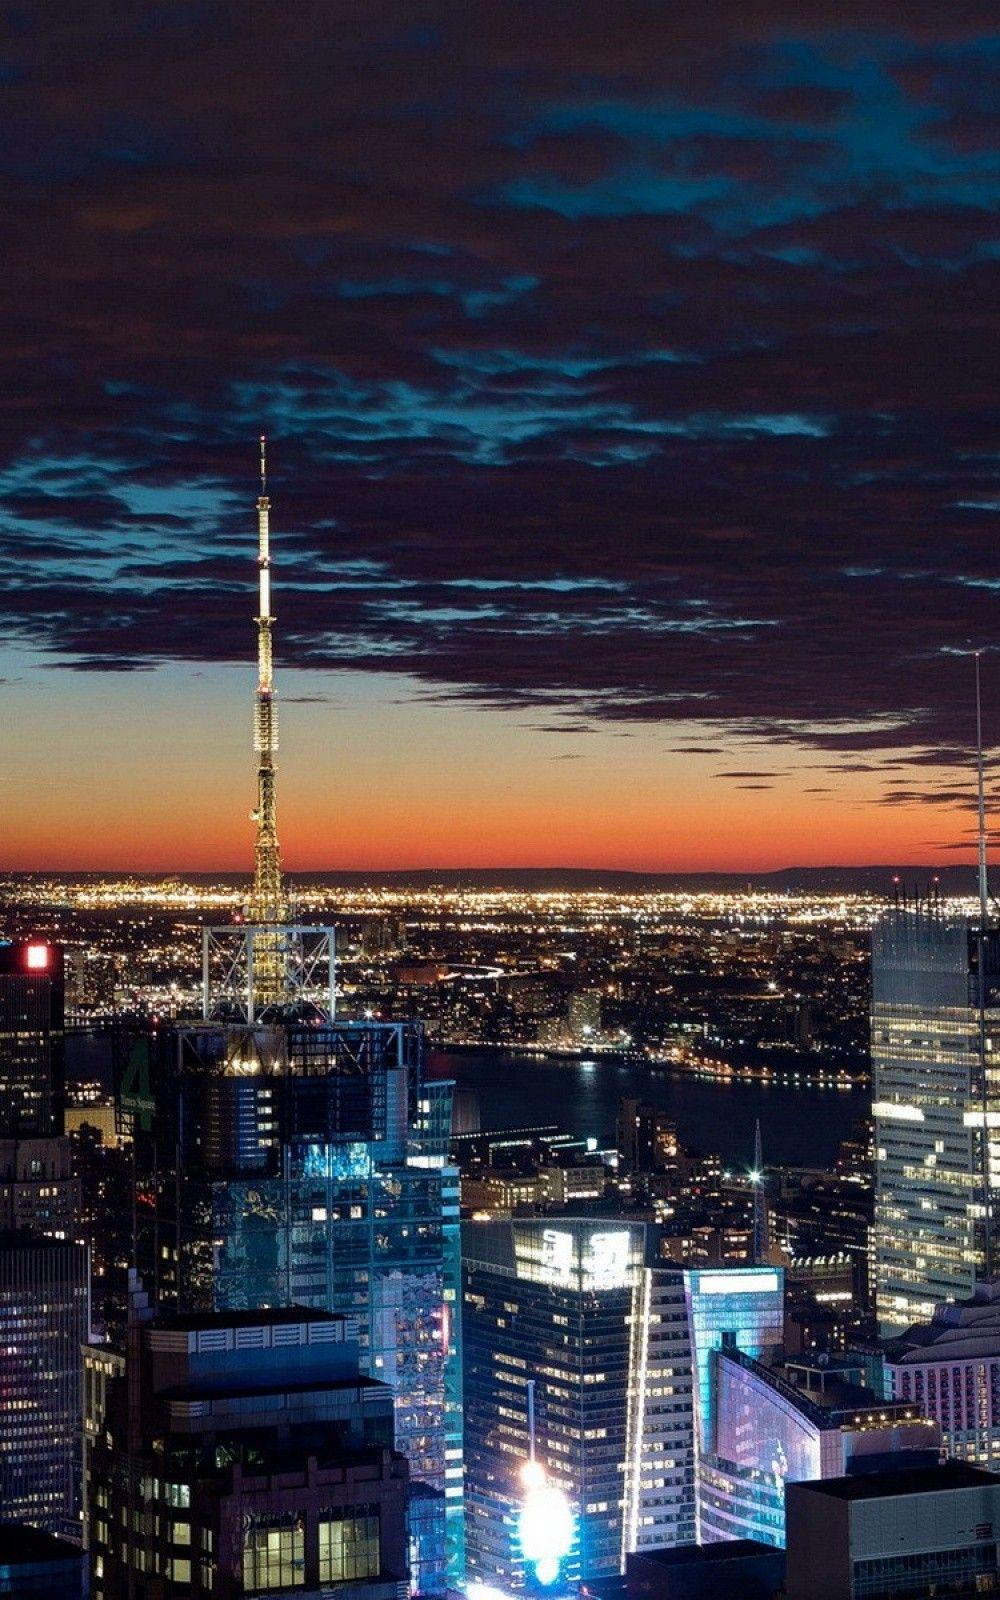 Dark Night City Skyline 4k Hd Android And Iphone Wallpaper Background And Lockscreen Check More At Https Phonewallp Com Dar Night City City Wallpaper Skyline